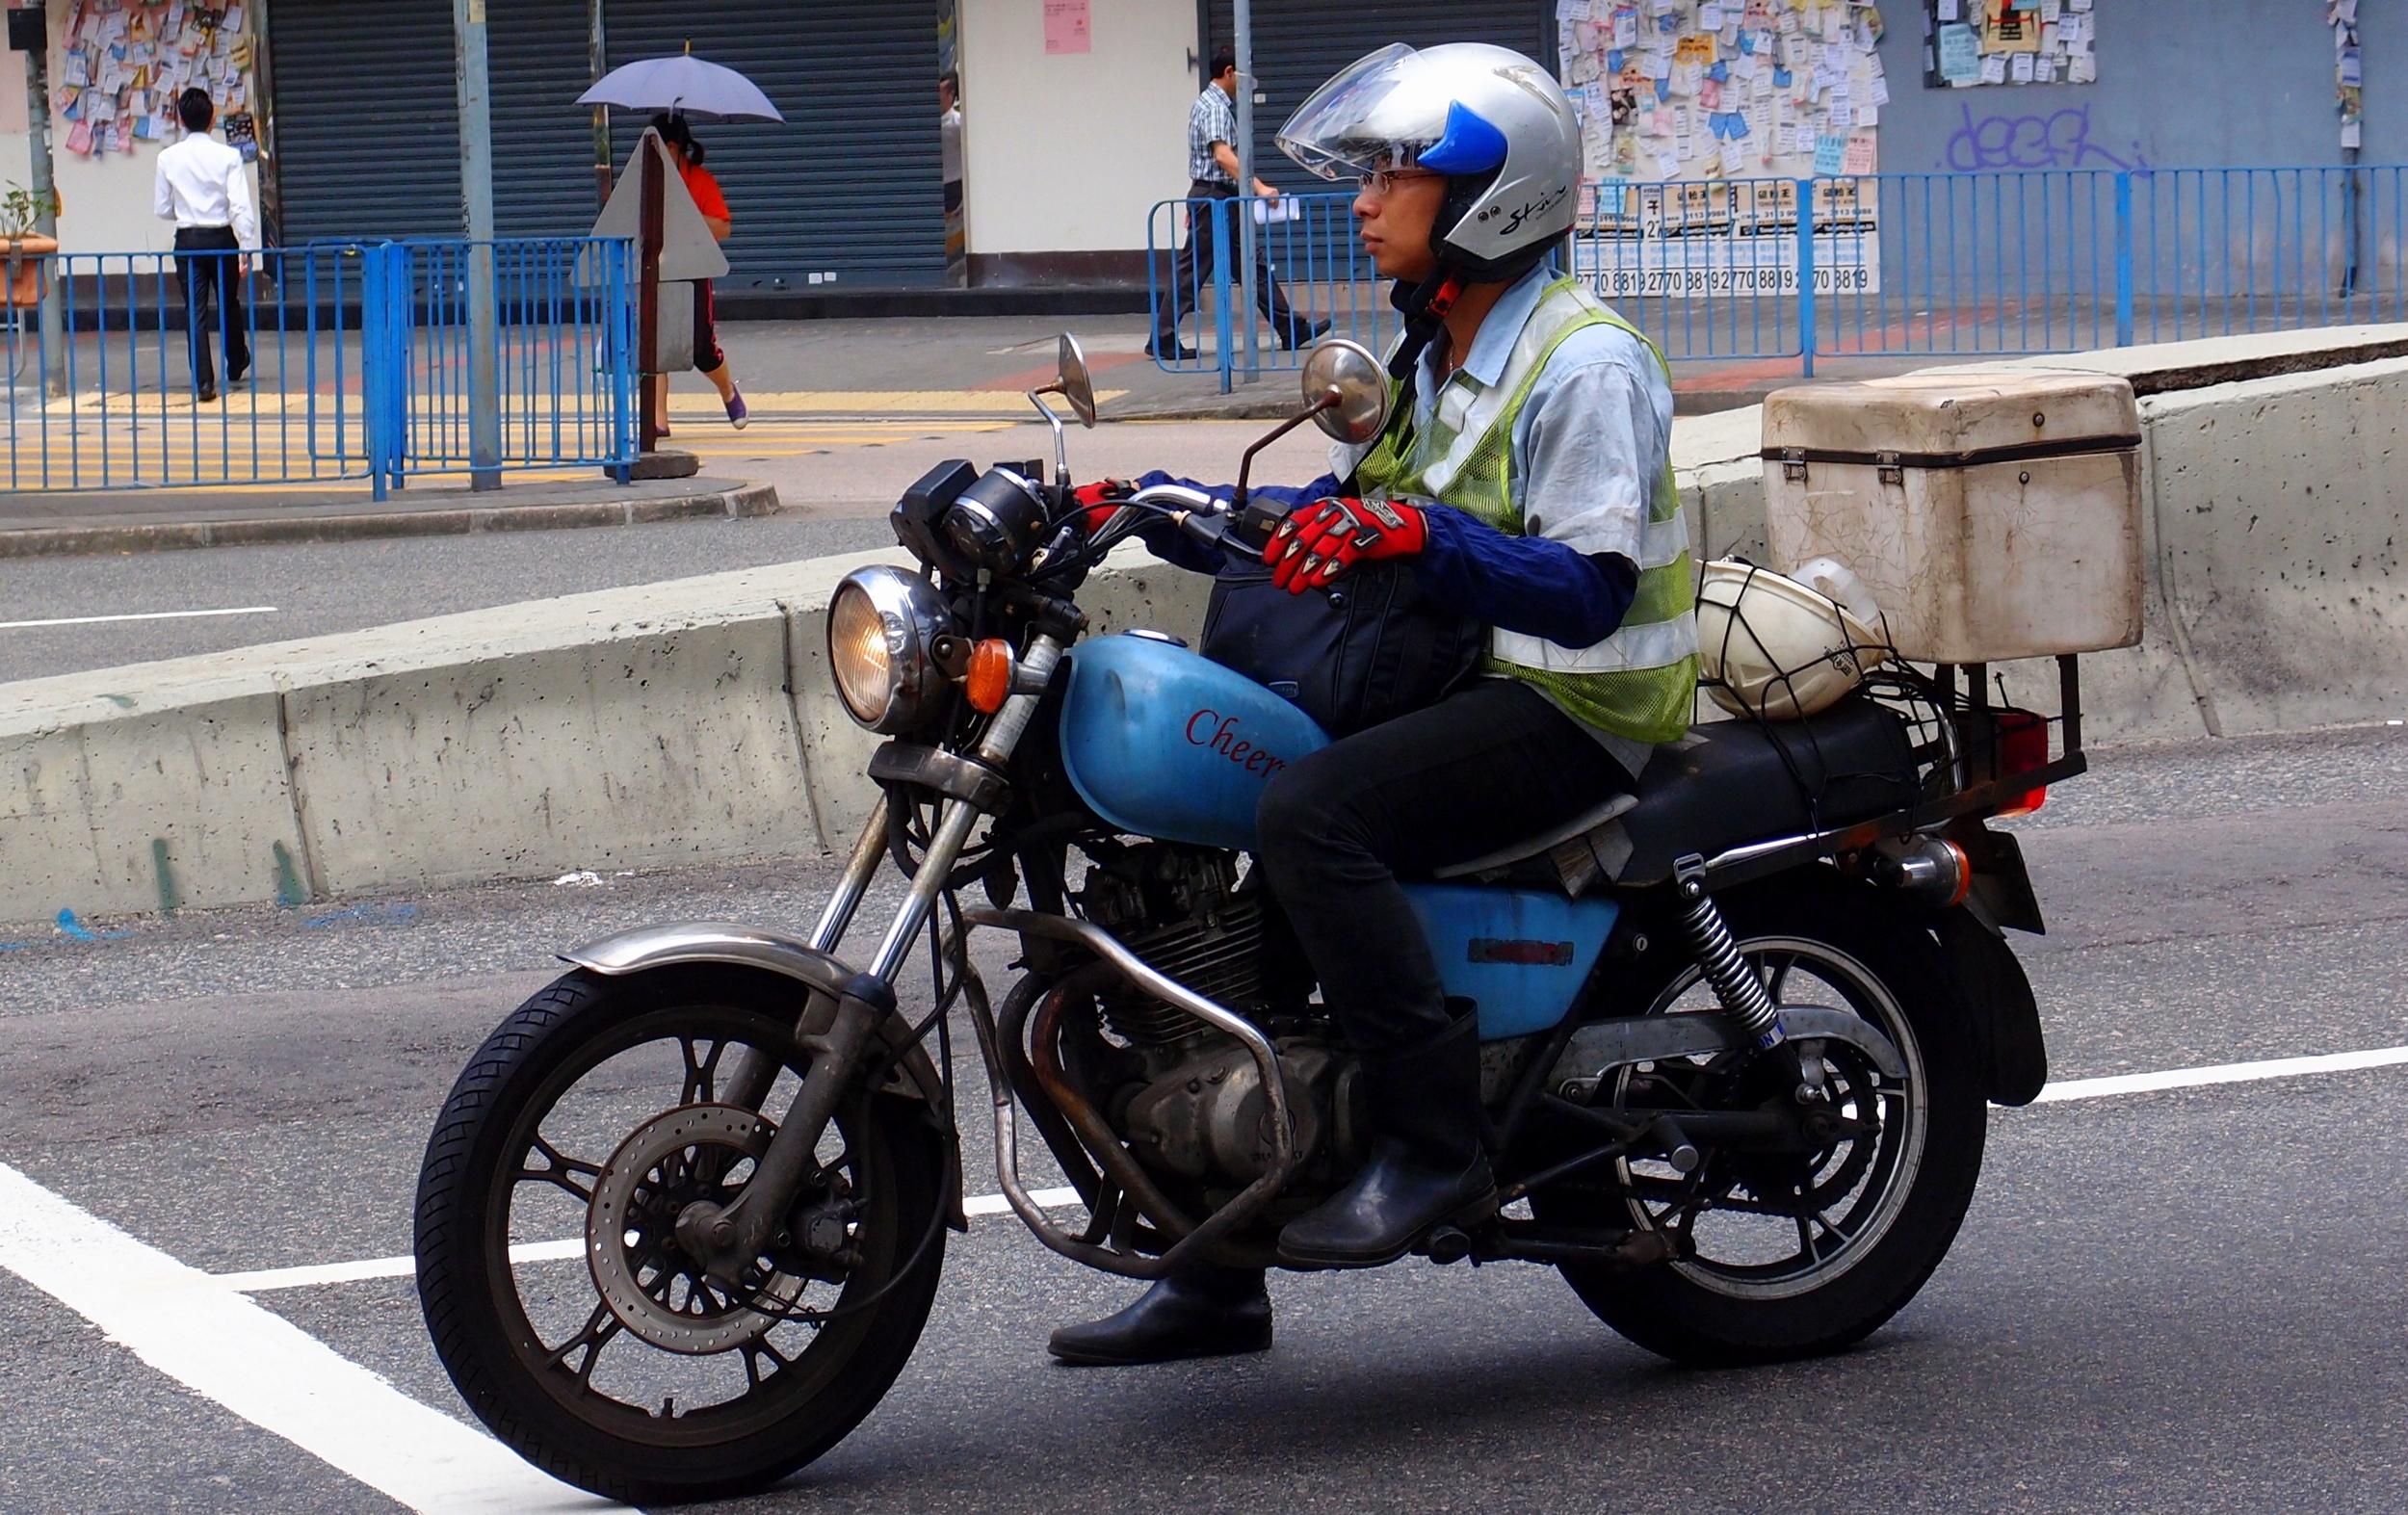 The chic biker look in Hong Kong